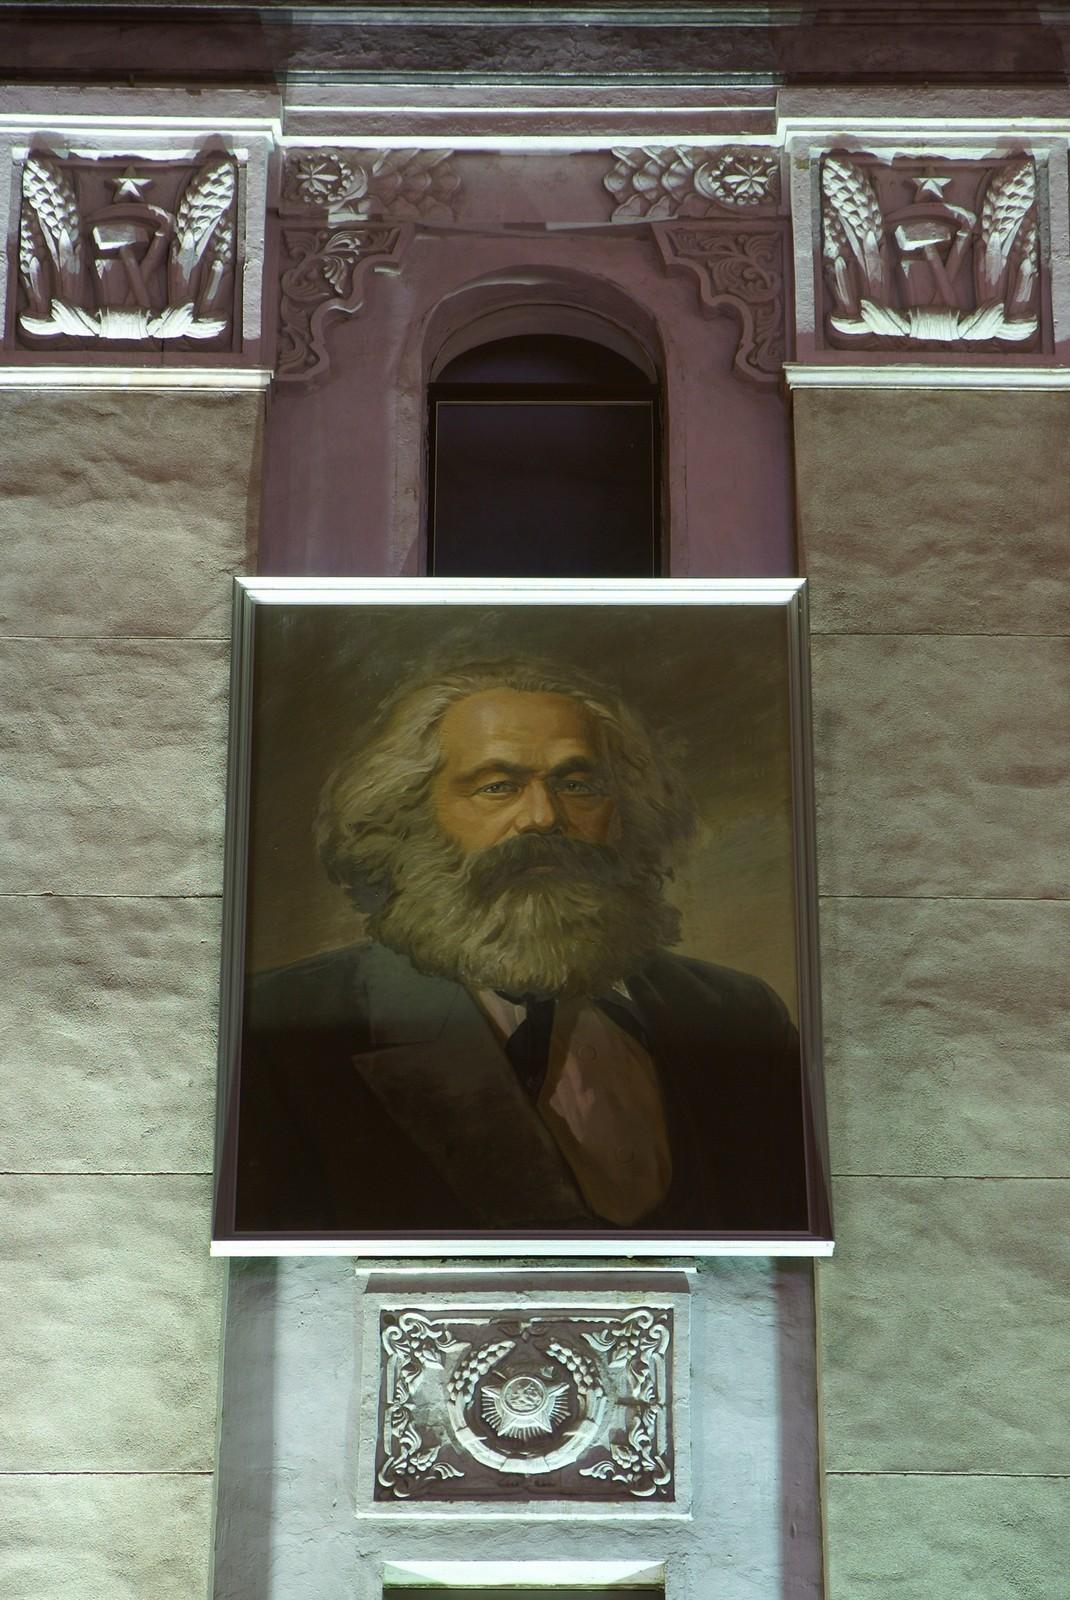 Portrait of Karl Marx at Kim Il Sung Square, Pyongyang